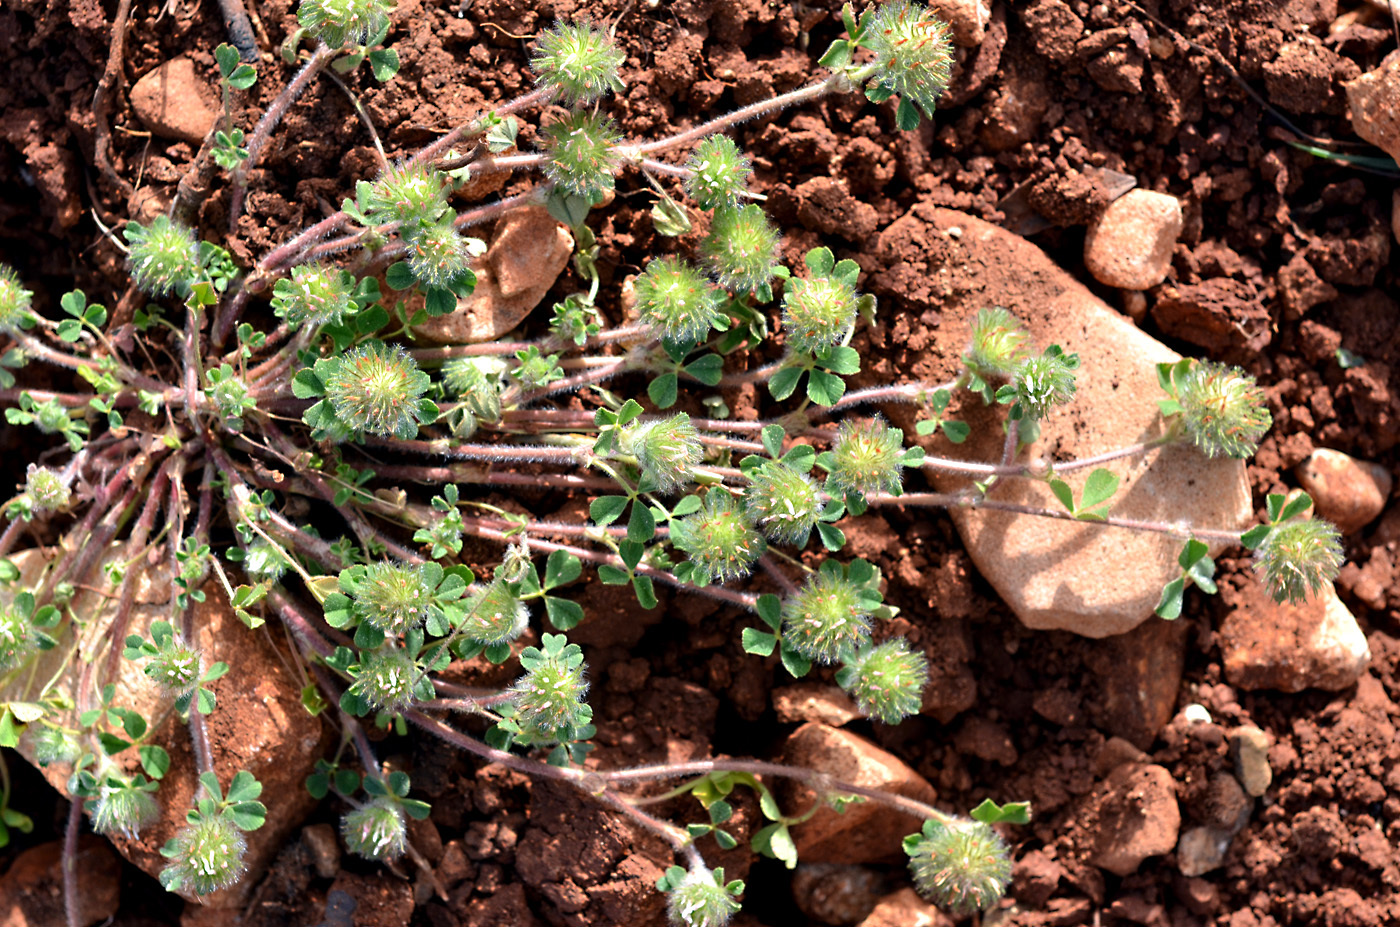 https://pictures.bgbm.org/digilib/Scaler?fn=Cyprus/Trifolium_cherleri_A1.jpg&mo=file